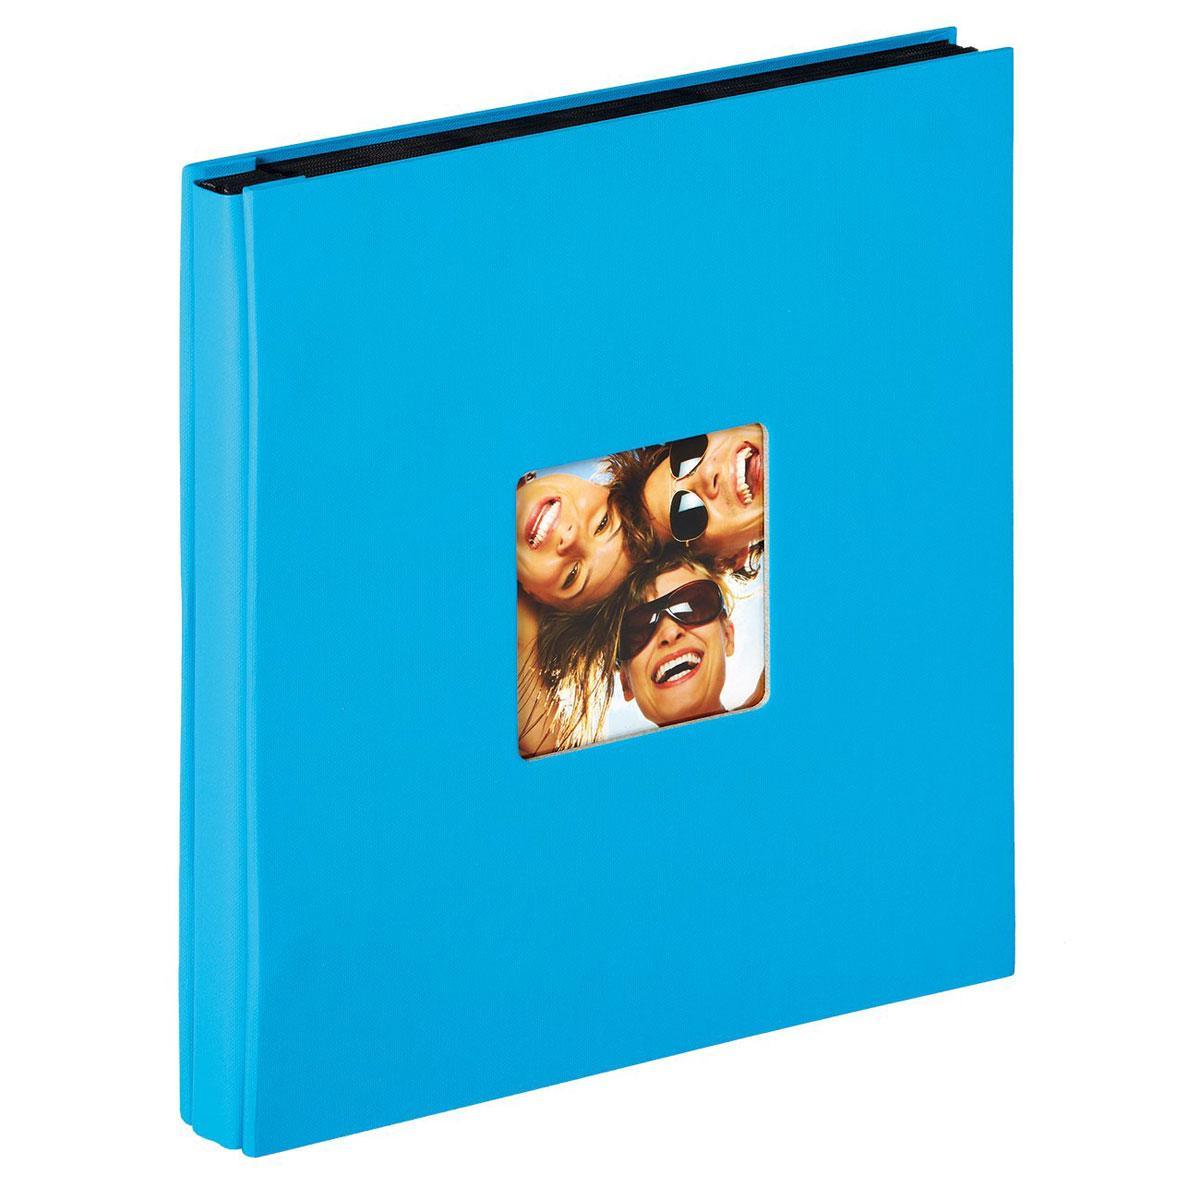 Альбом Walther 10*15/400 Fun EA-110-U ocean blue